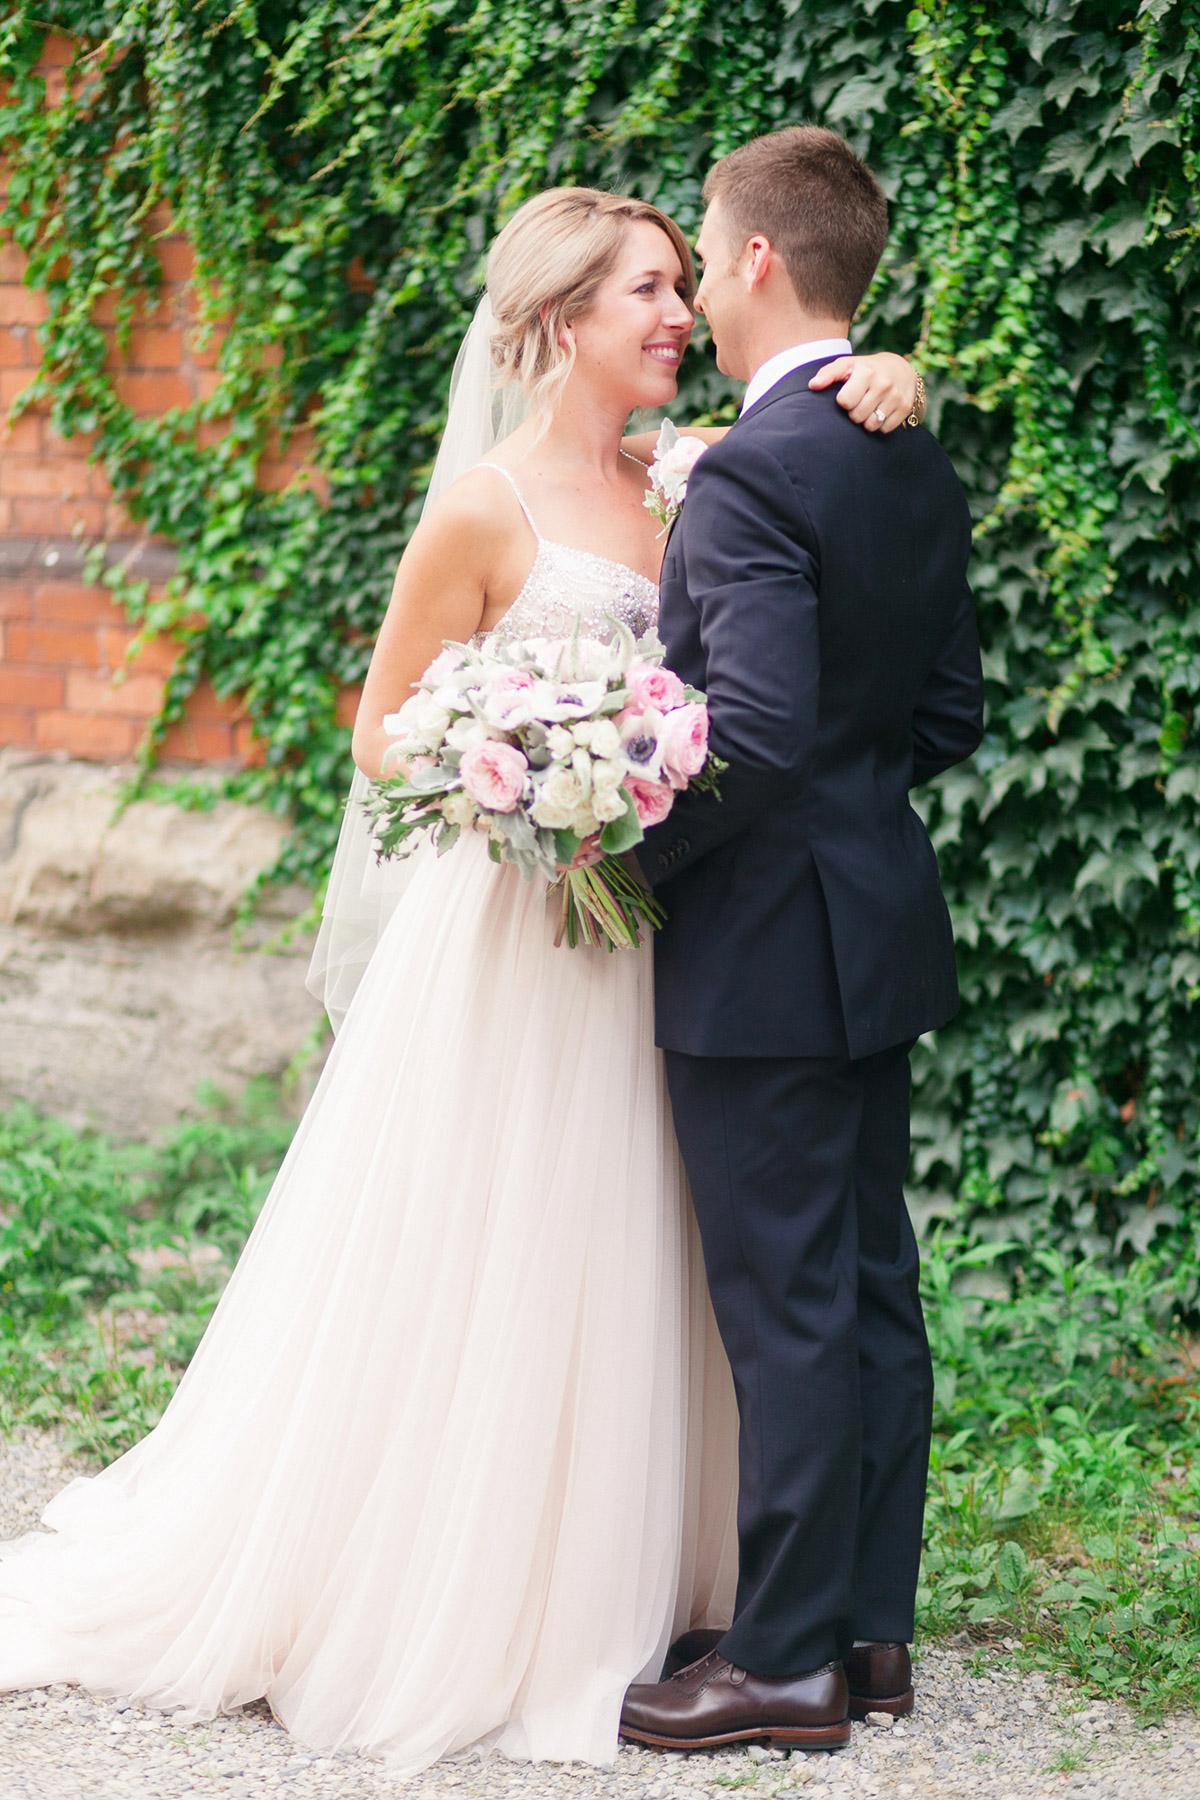 jennifer-xu-photography-vineyard-bride-swish-list-spice-factory-hamilton-wedding-2.jpg